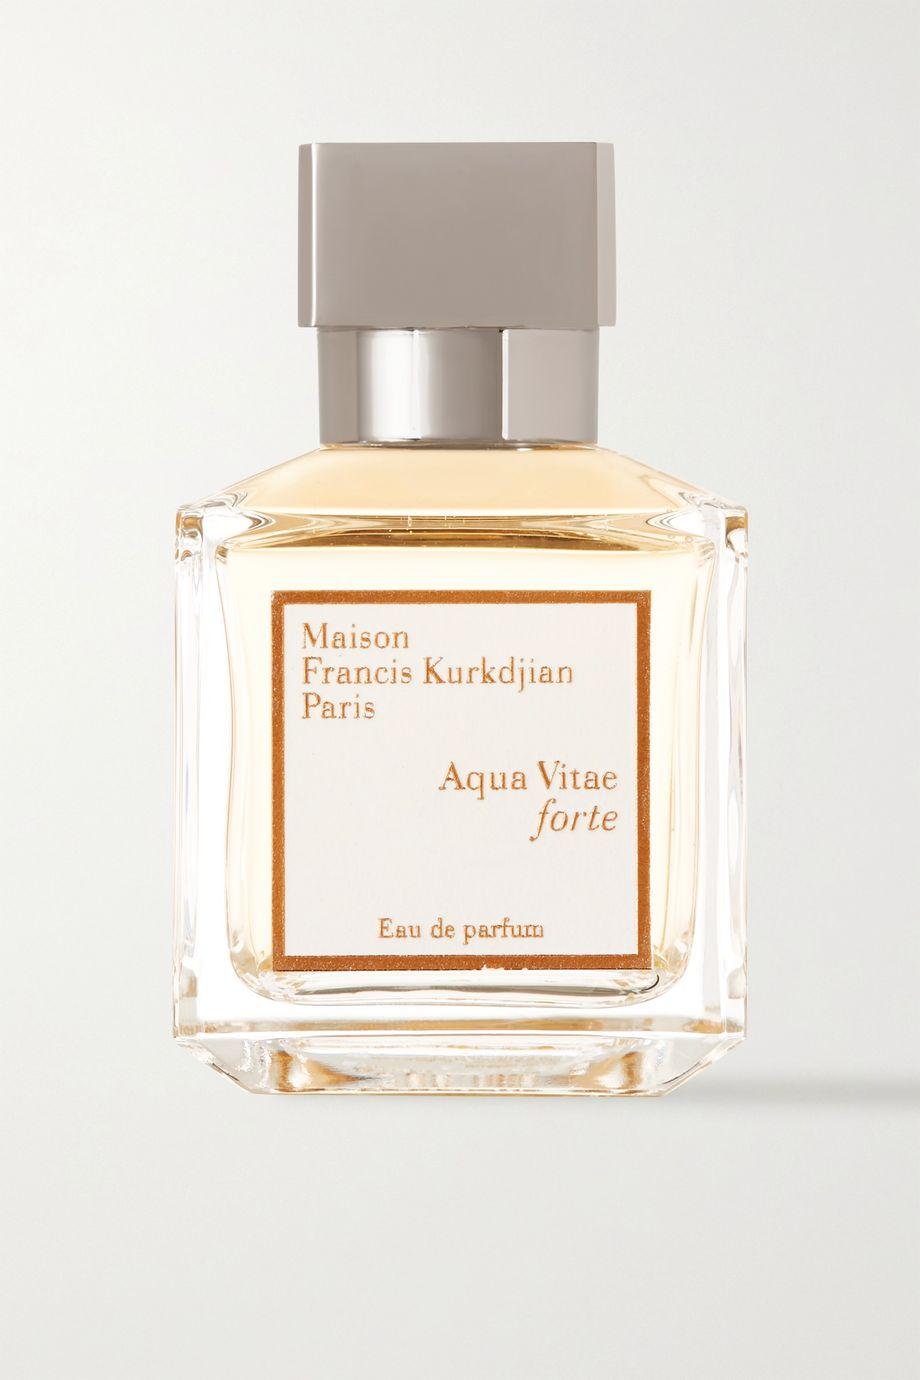 Maison Francis Kurkdjian Eau de Parfum - Aqua Vitae Forte, 70ml